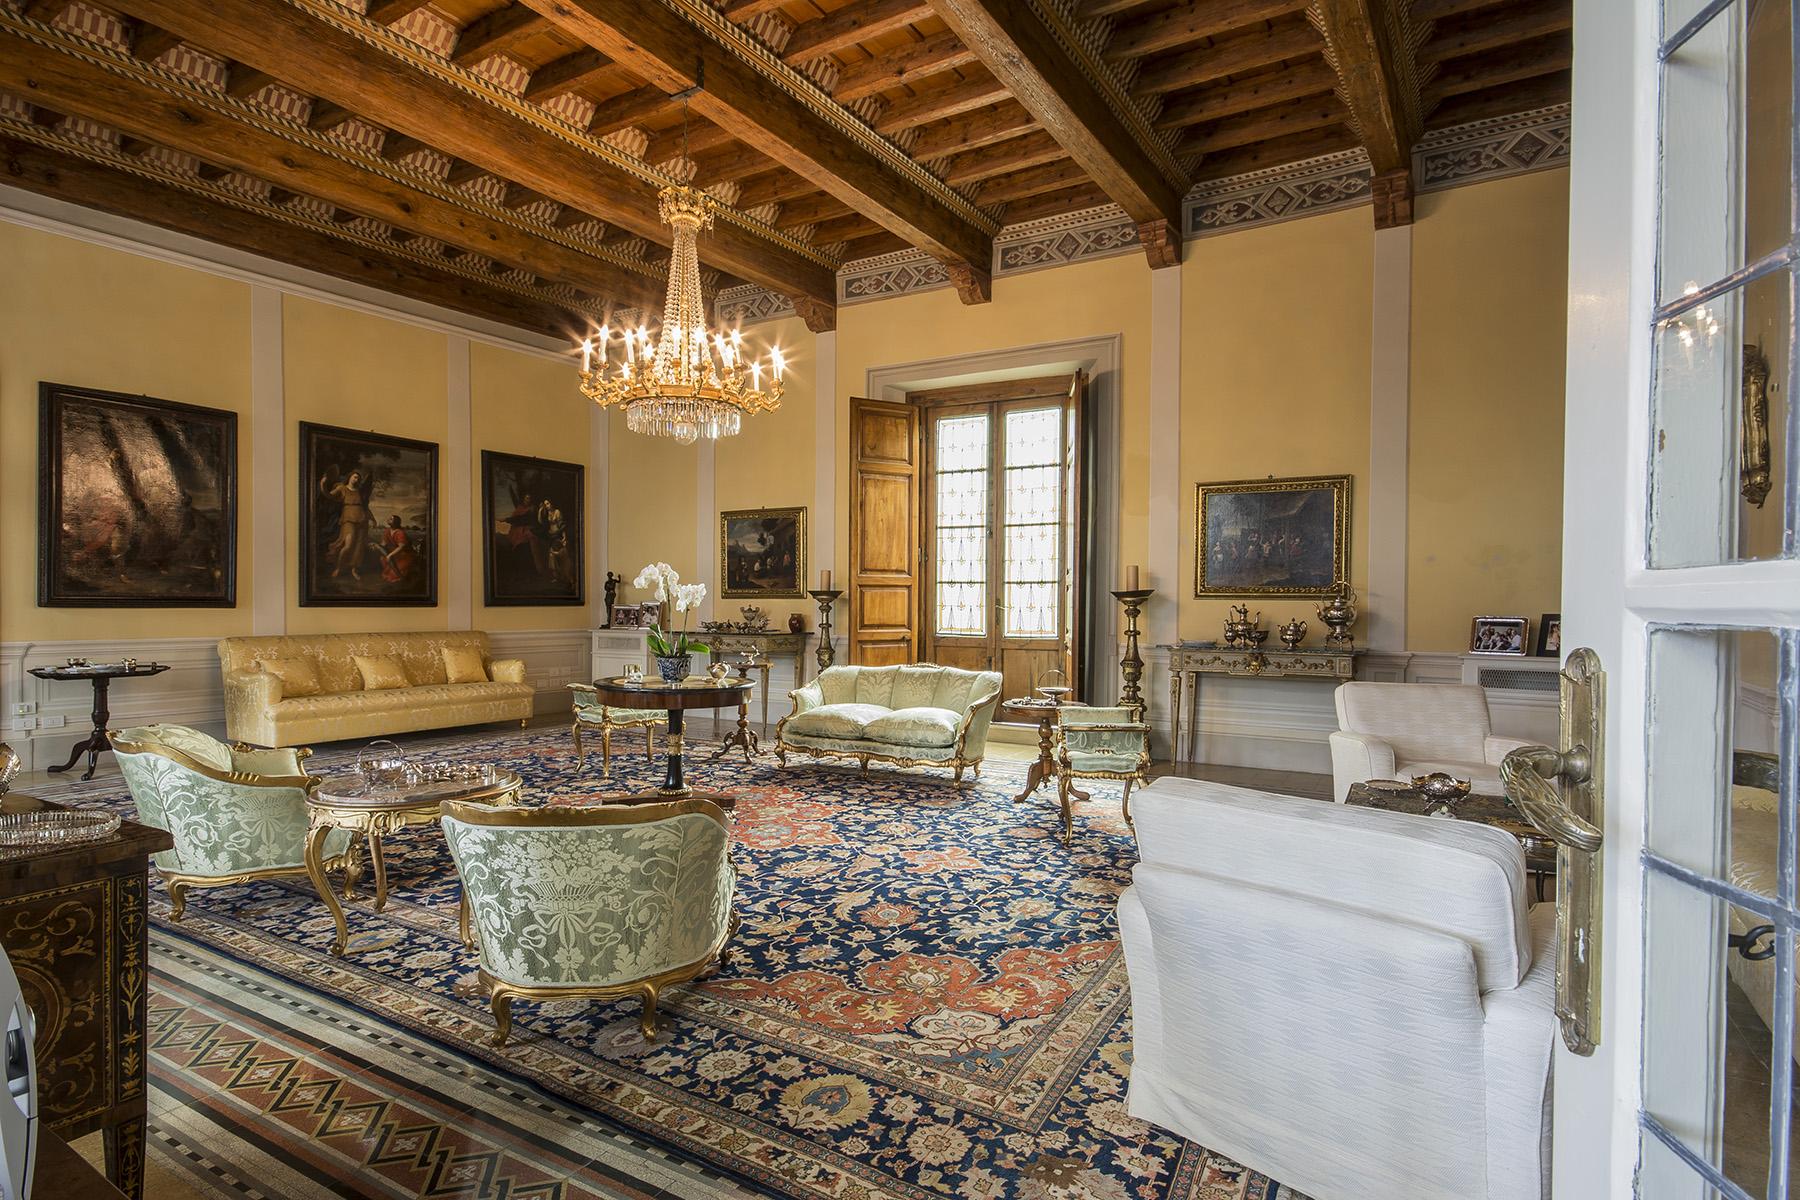 Villa in Vendita a Lucca: 5 locali, 1200 mq - Foto 1